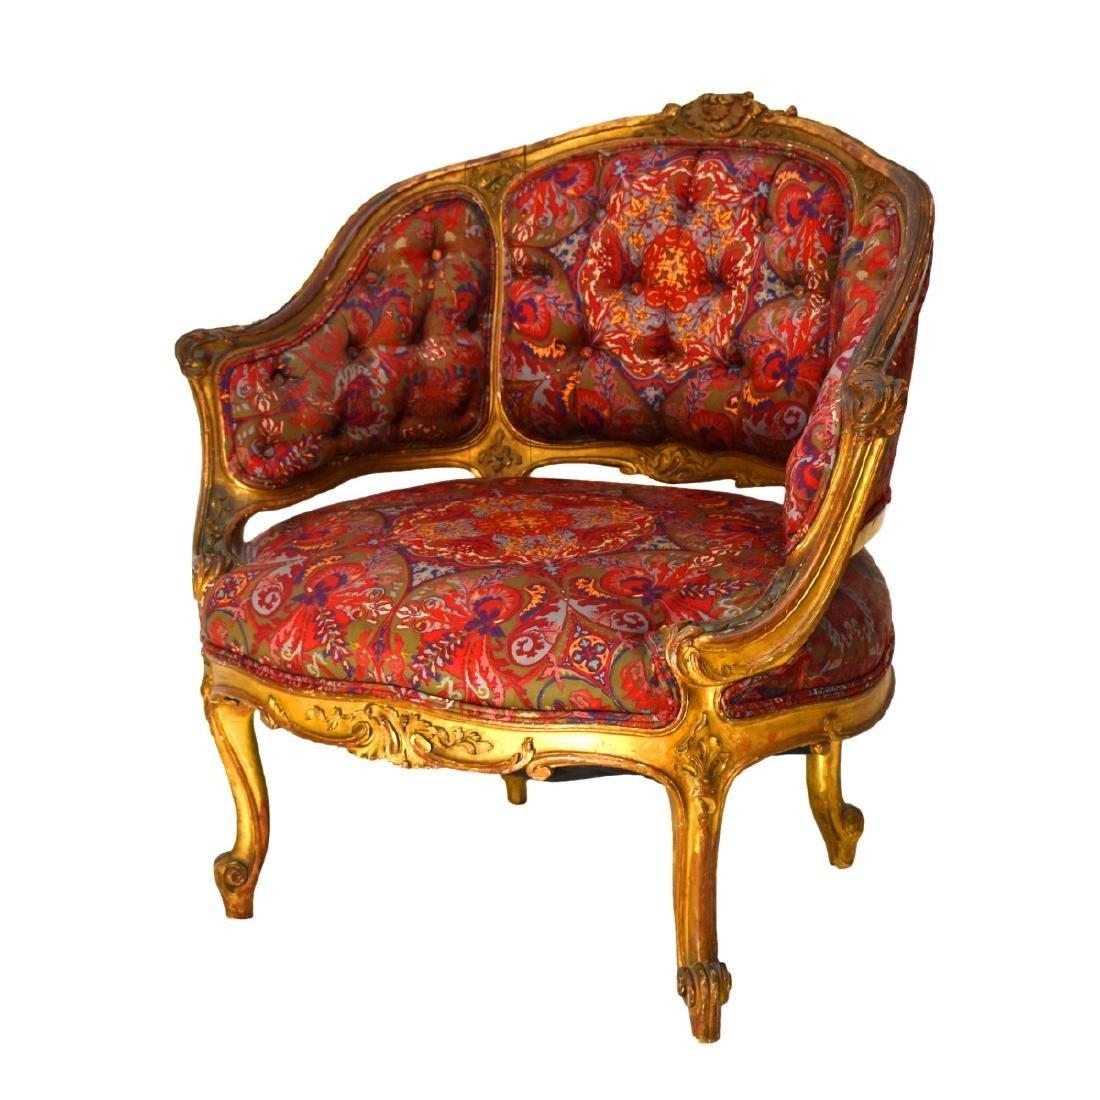 19th Century Louis XVI Style Bergere Chair